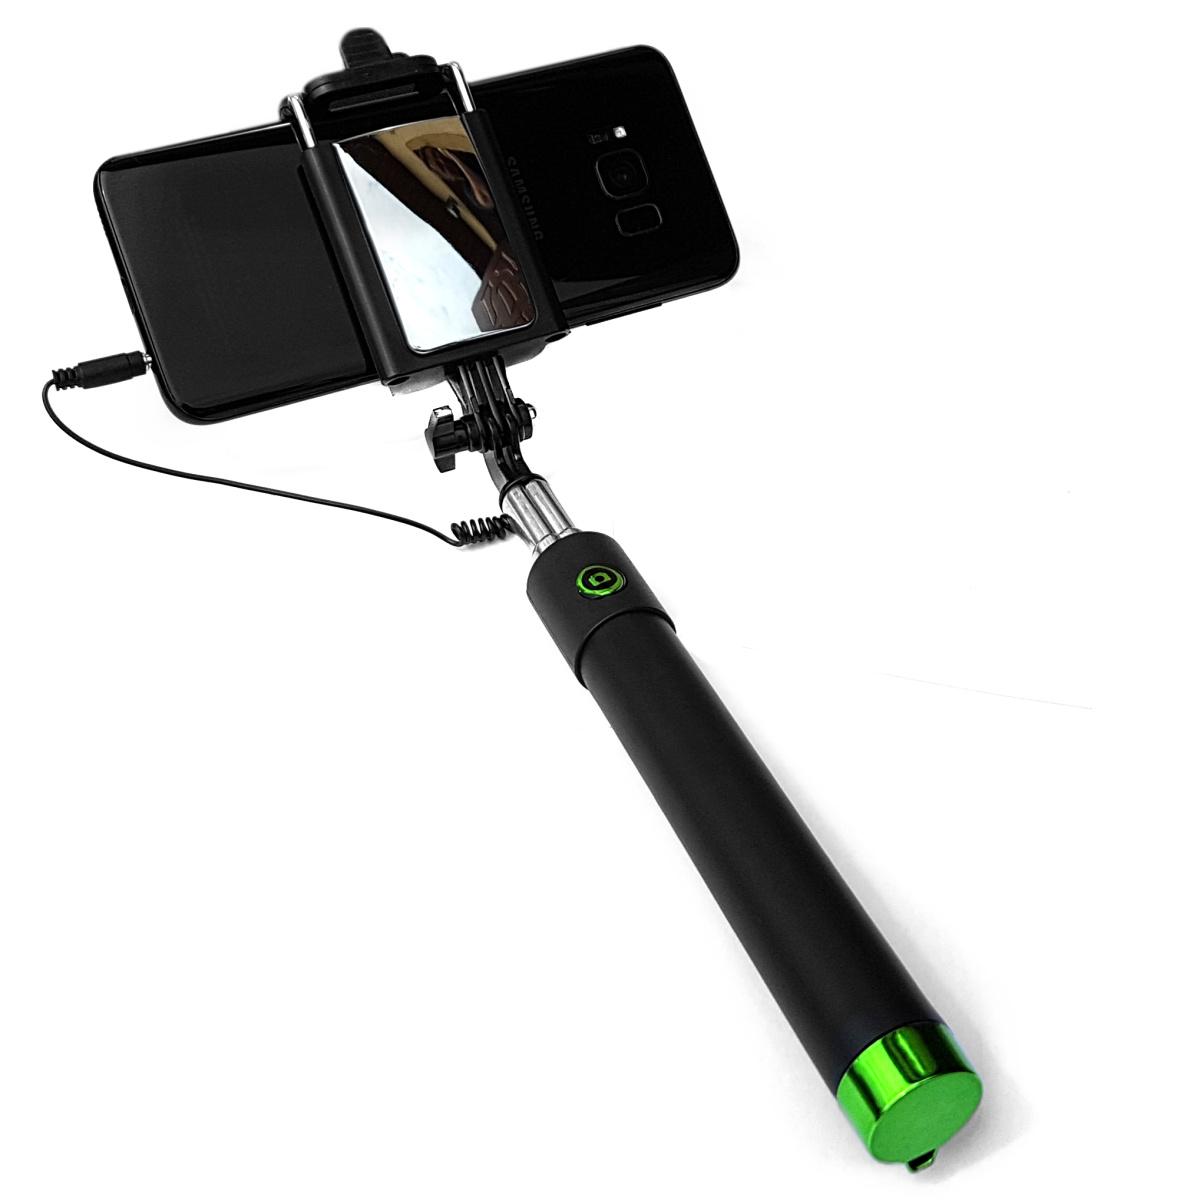 Kijek Selfiestick Monopod Honor 8 Lite